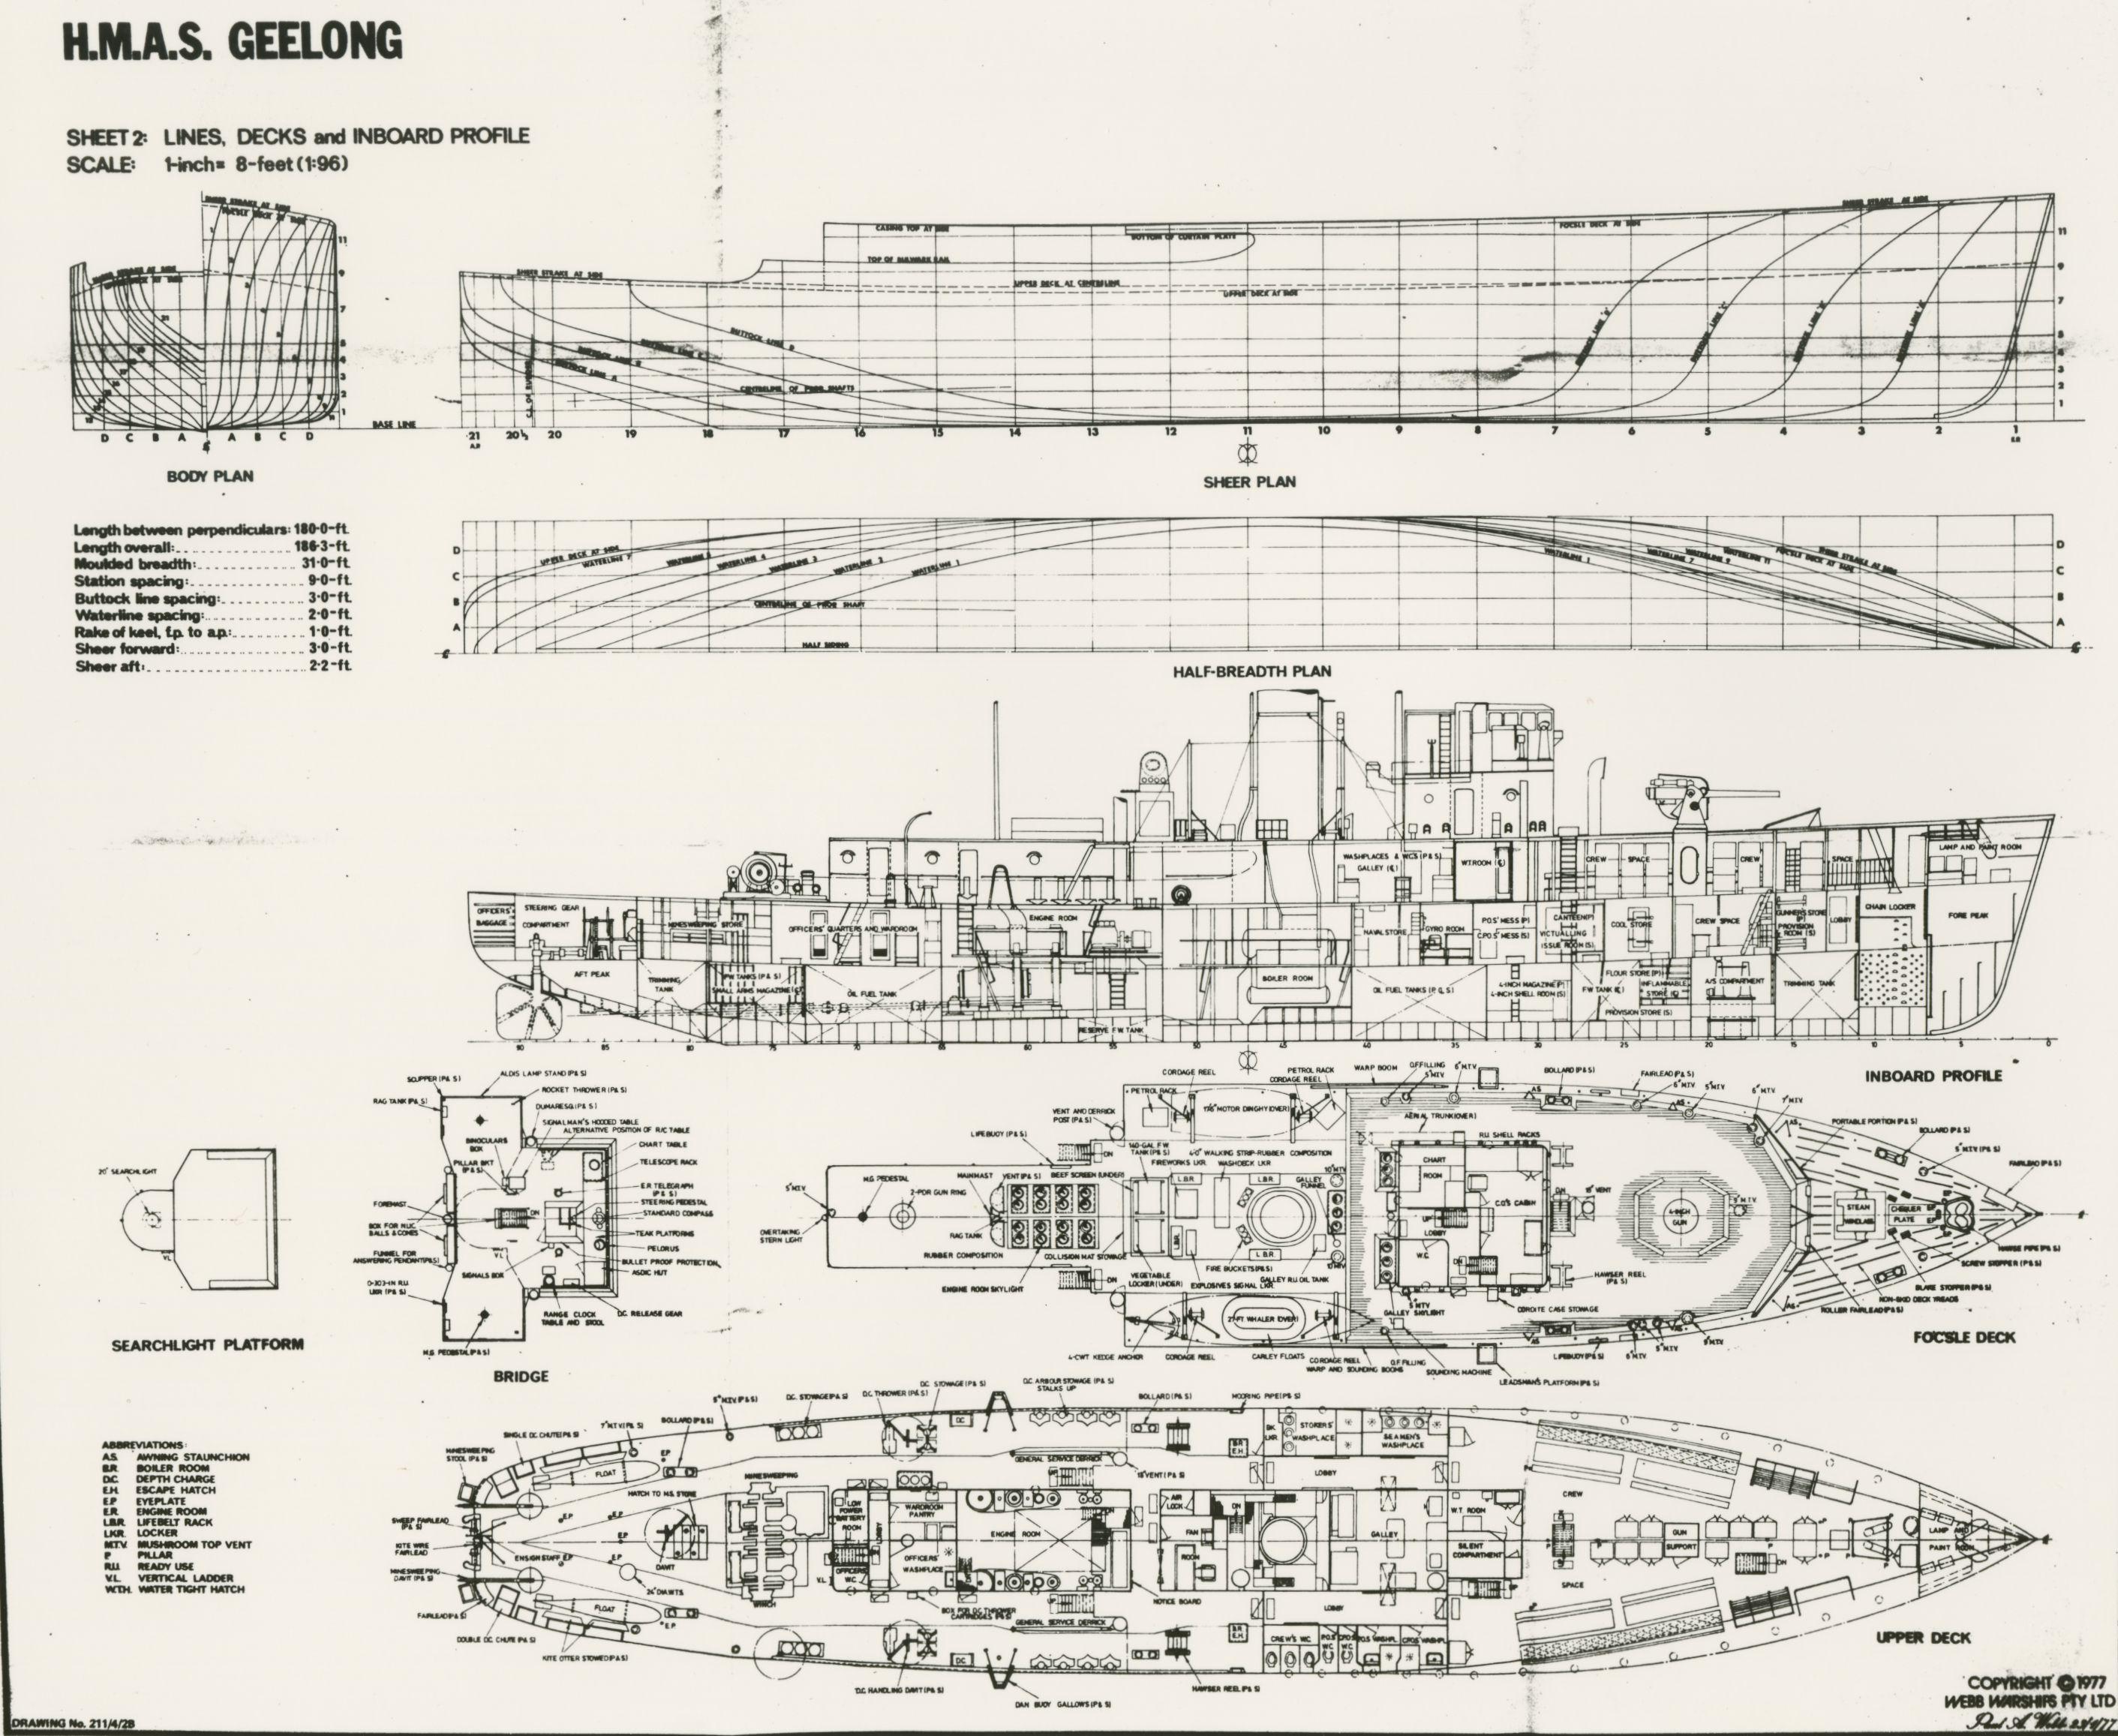 HMAS Geelong (I) | Royal Australian Navy